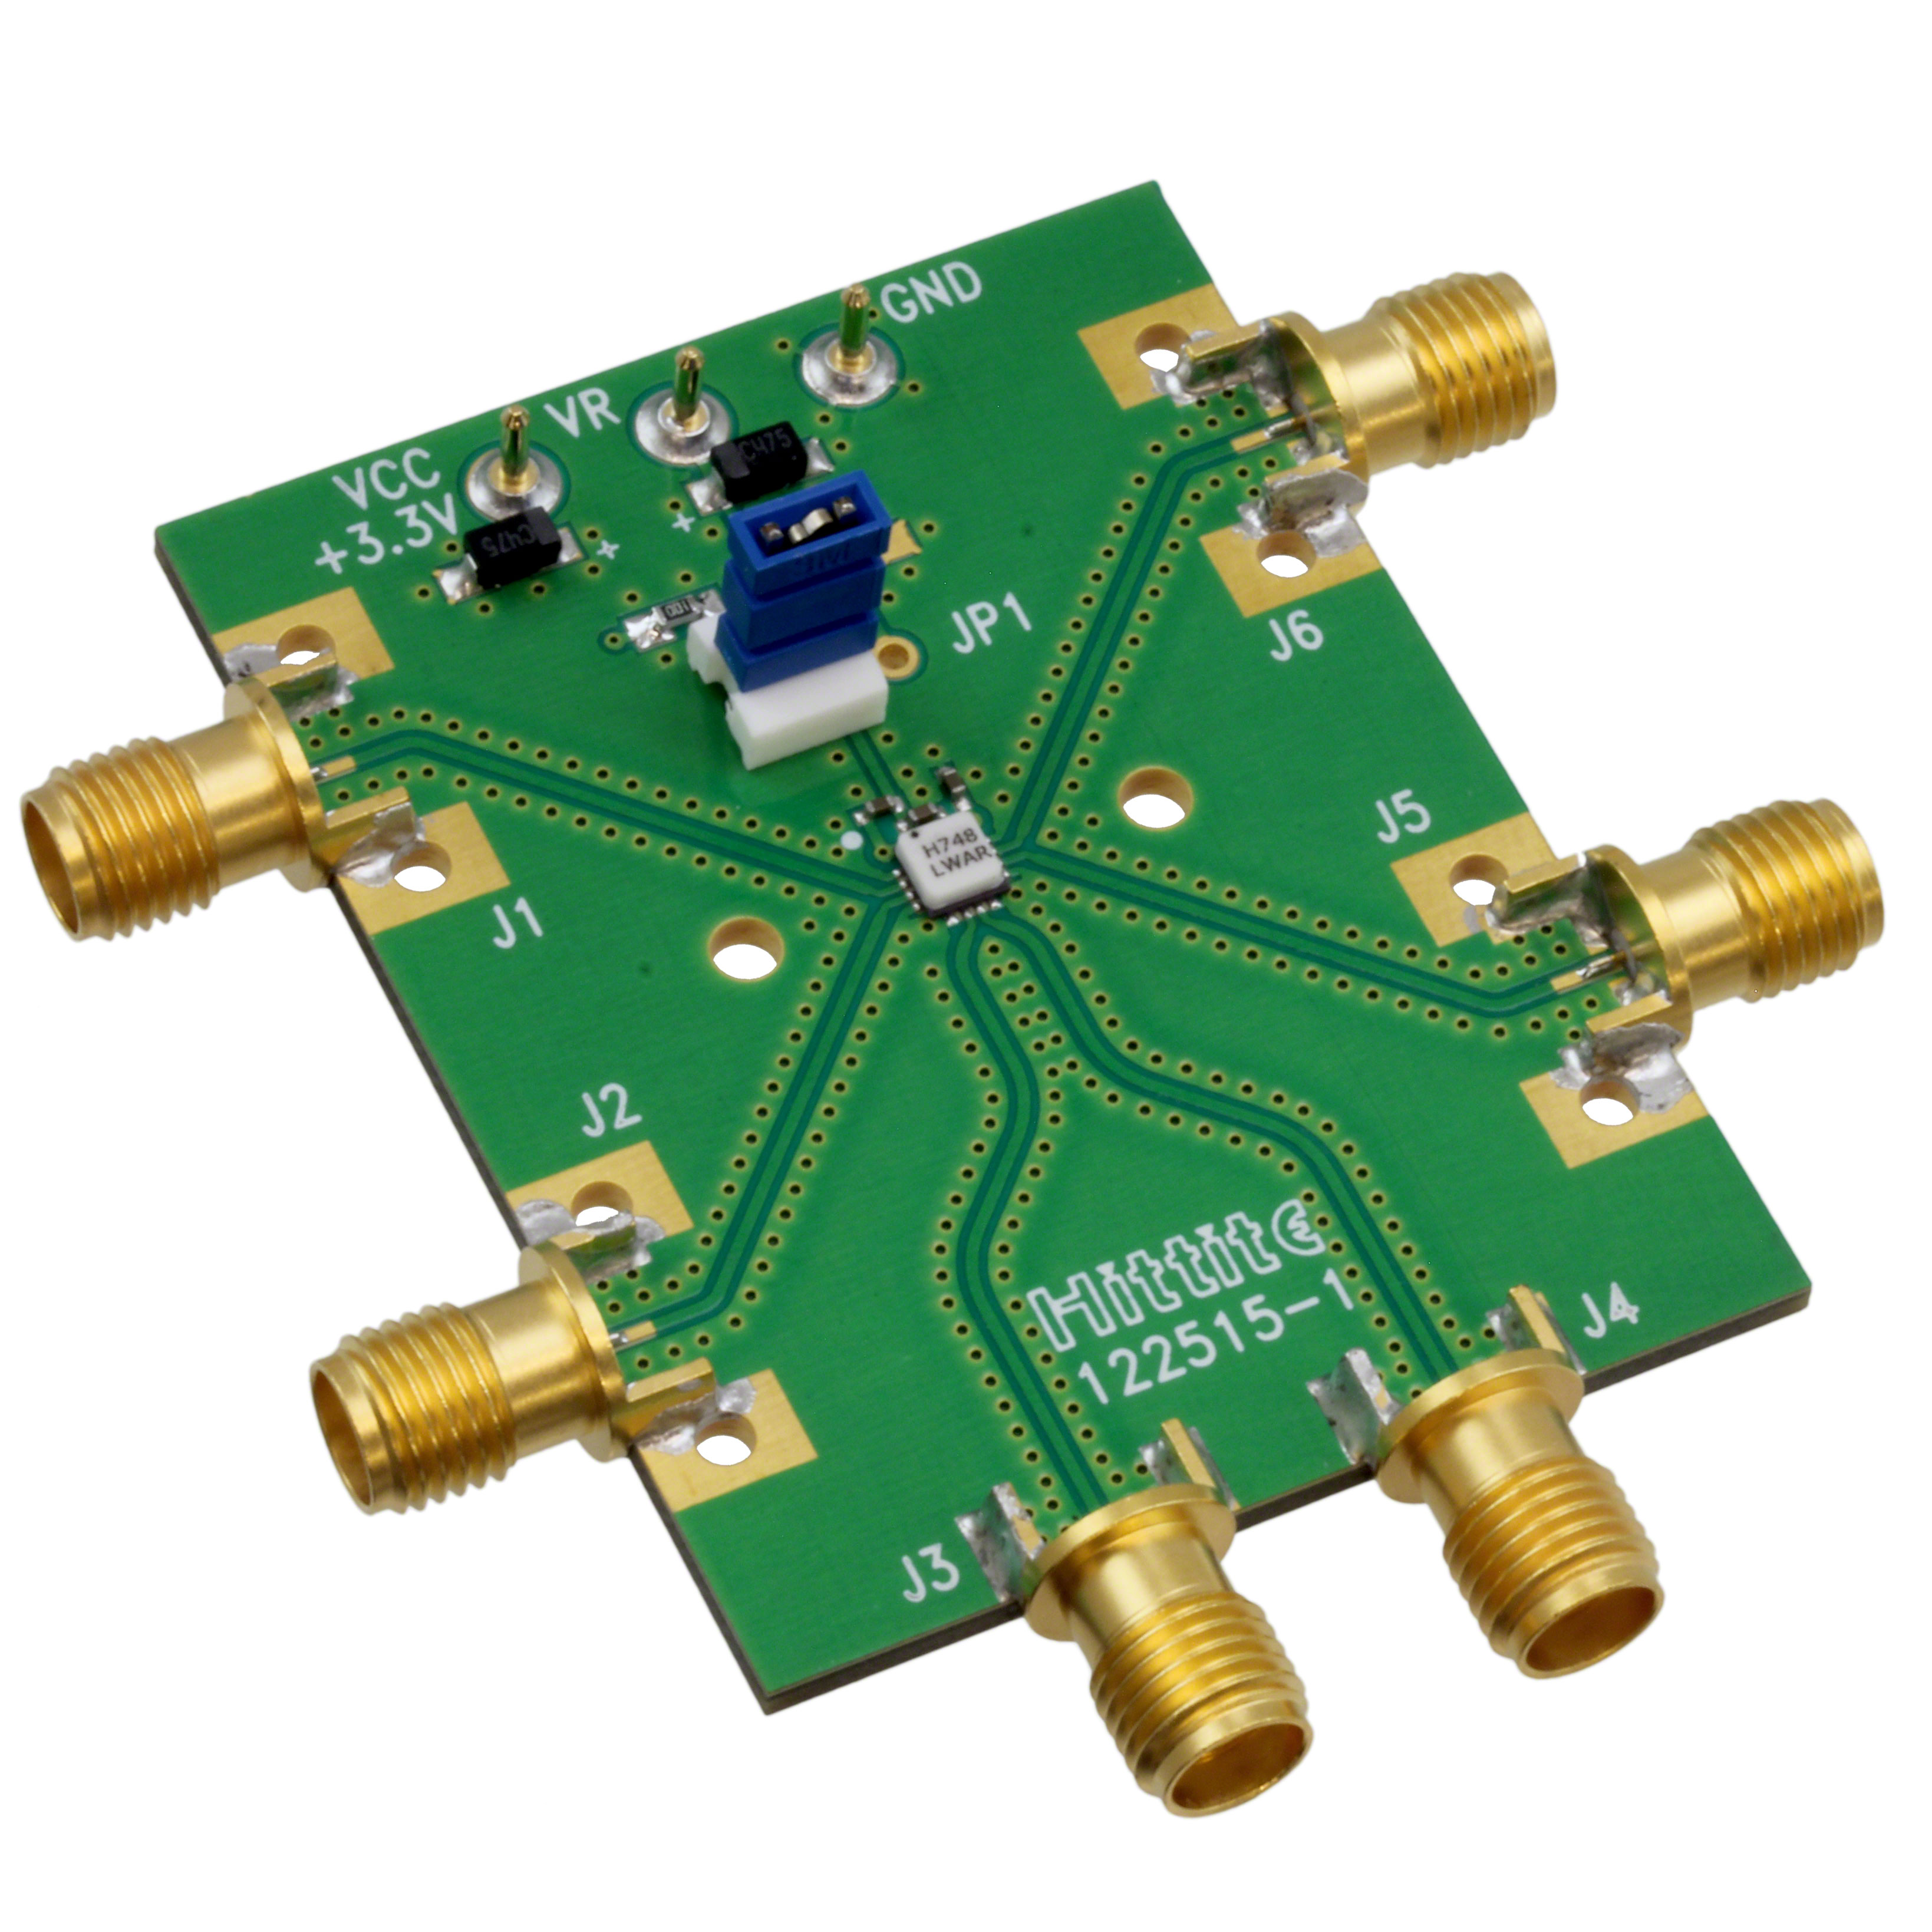 Motor Driver Circuit Based On Lv8741v Ic Image